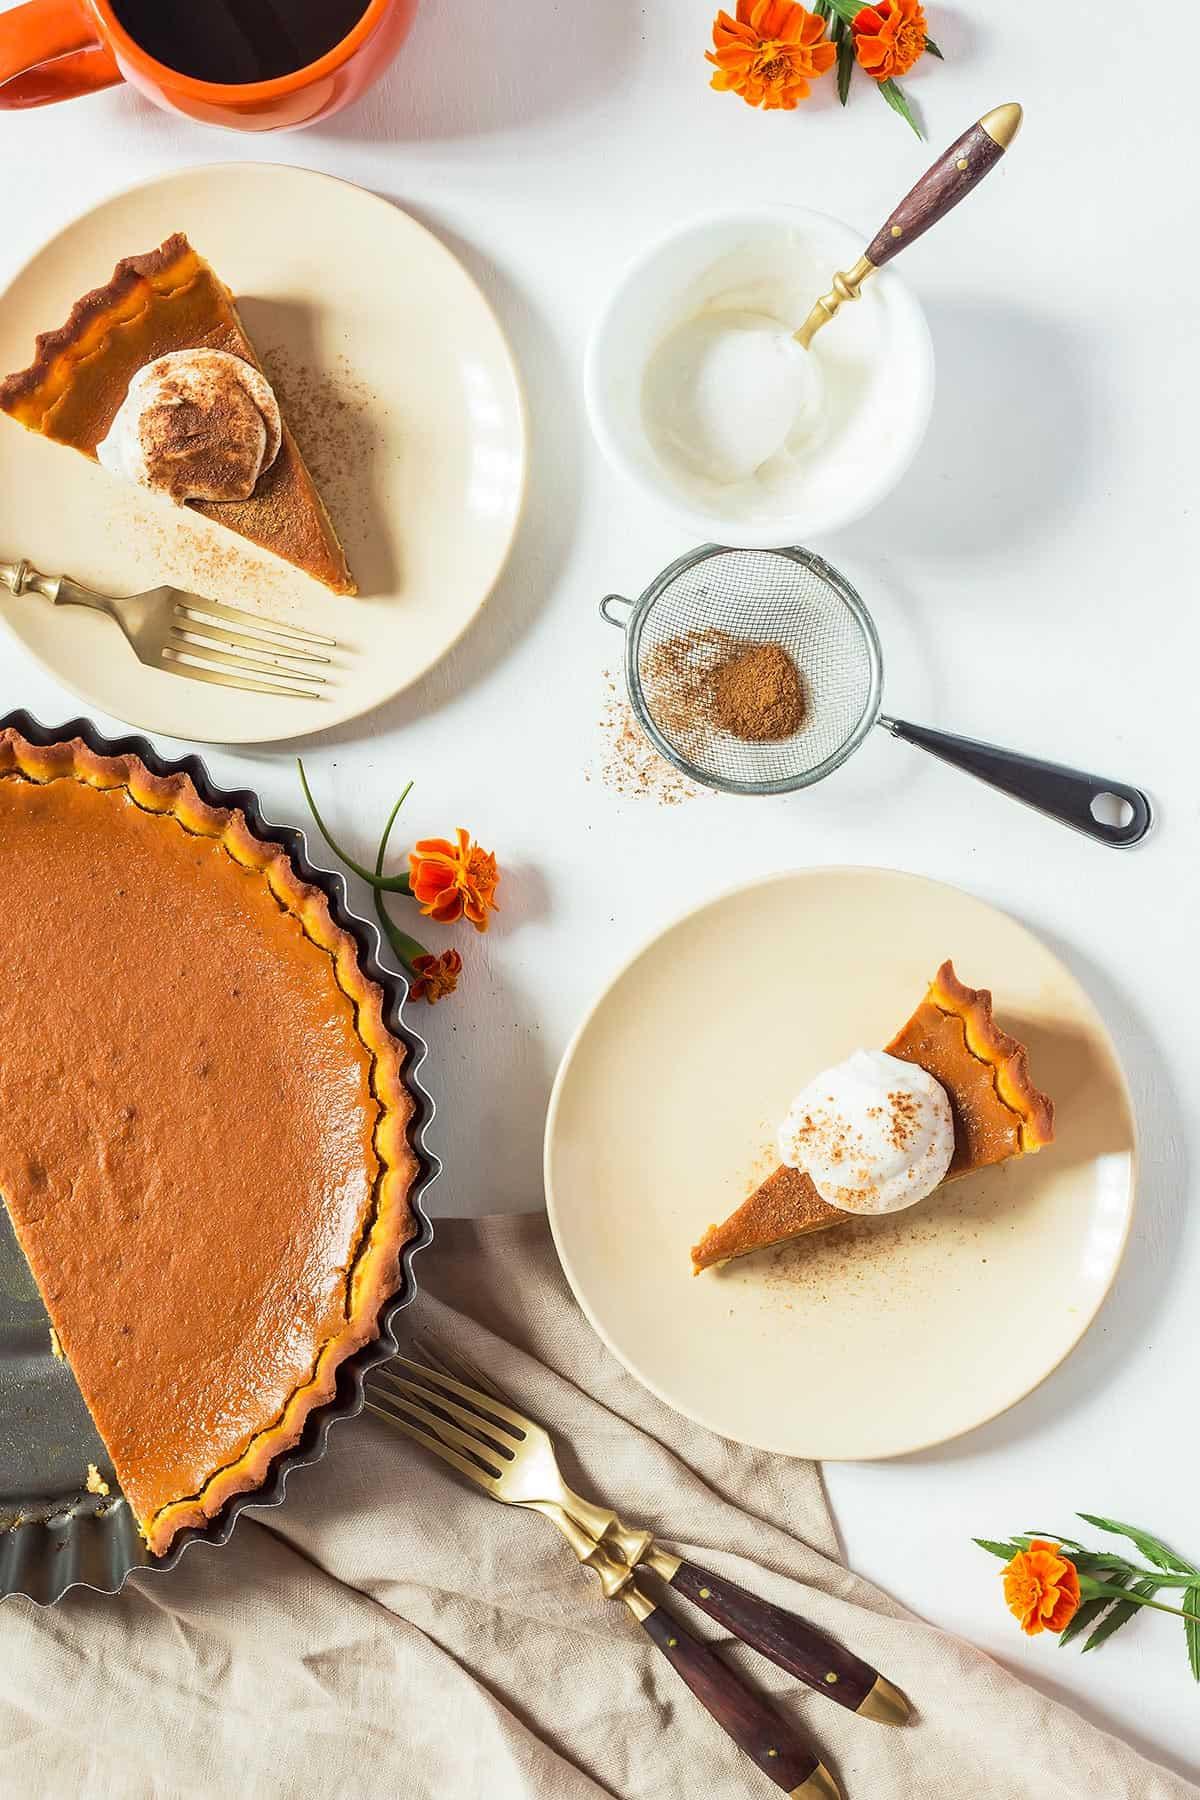 Plates of Low-carb Pumpkin Pie